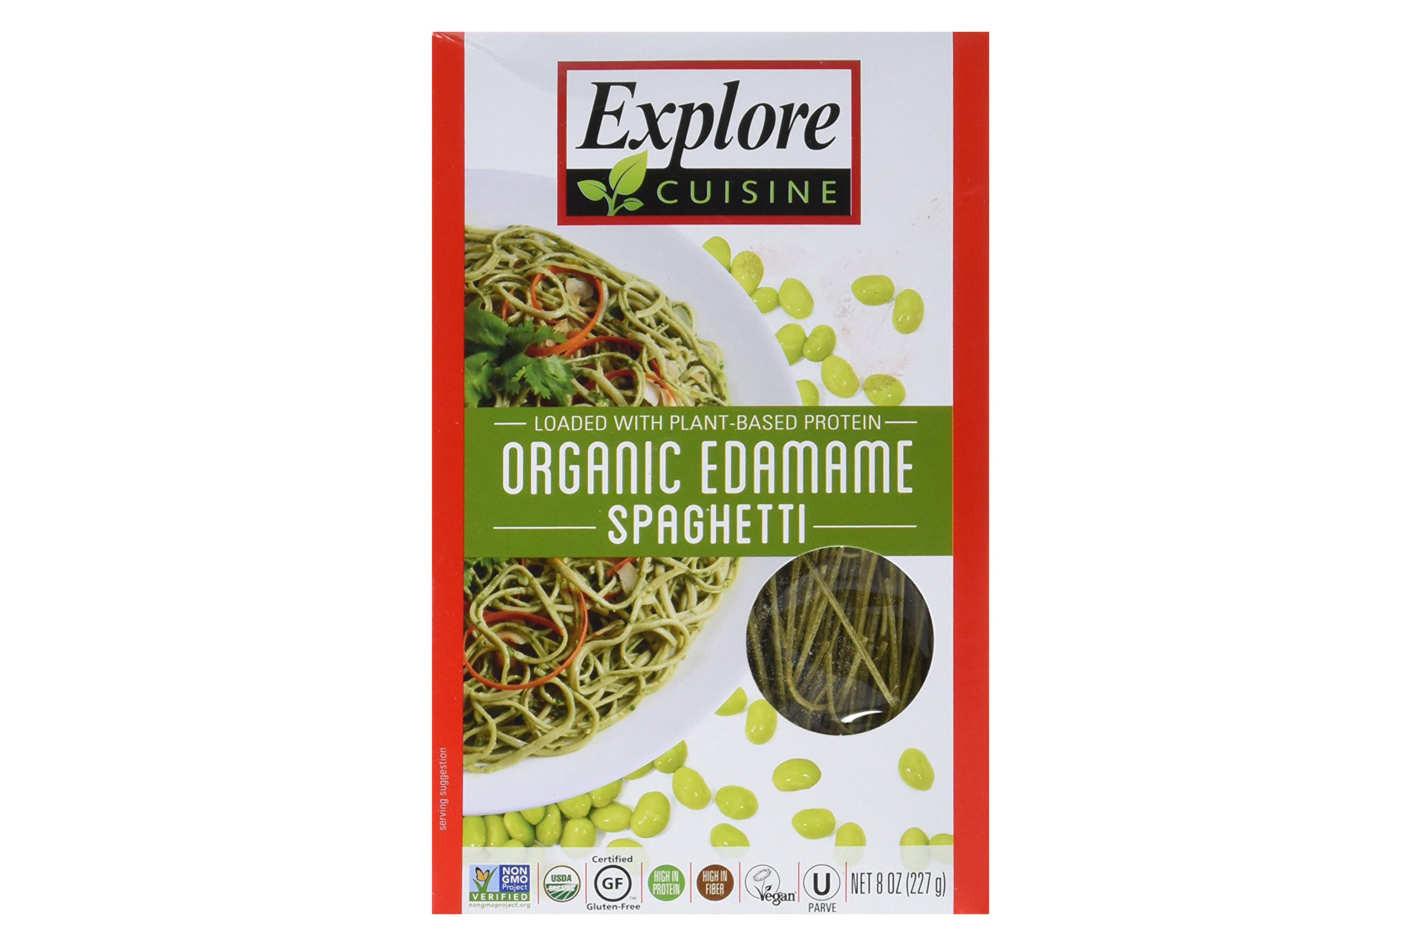 Explore Cuisine Organic Edamame Spaghetti  Best Gluten Free Plant Based Pasta Review 2017